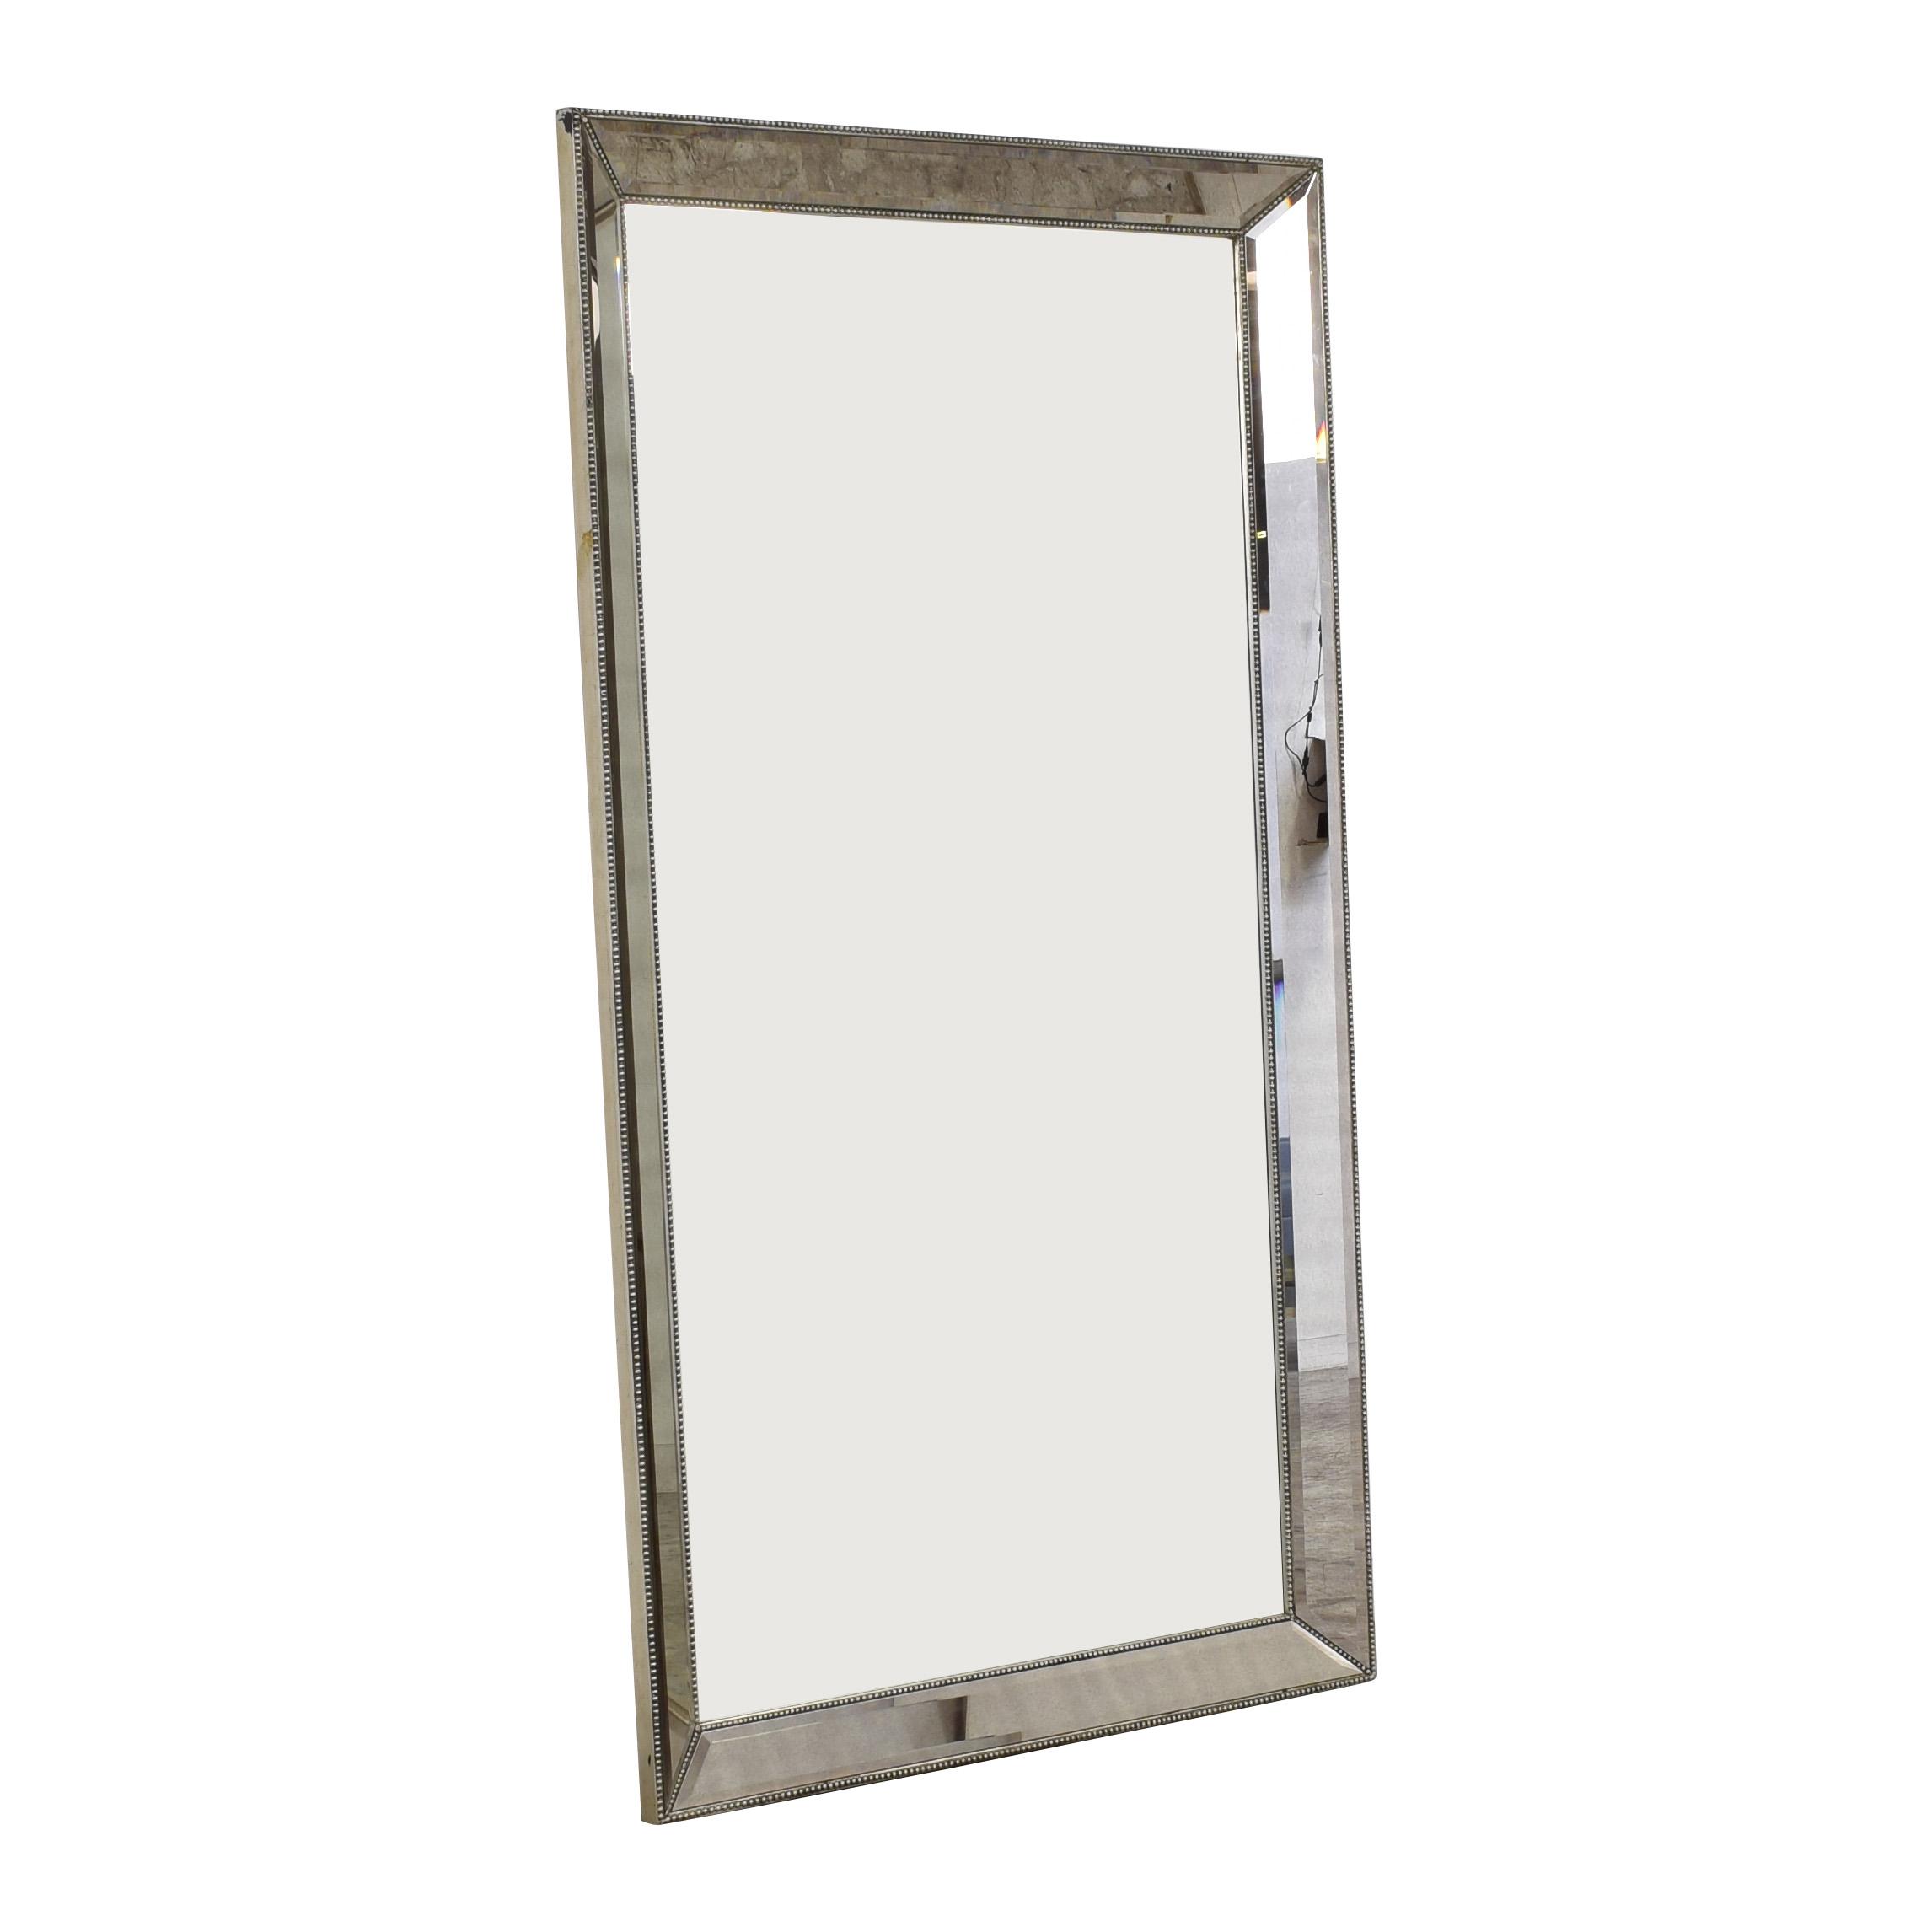 Bassett Mirror Company Beaded Leaner Mirror sale